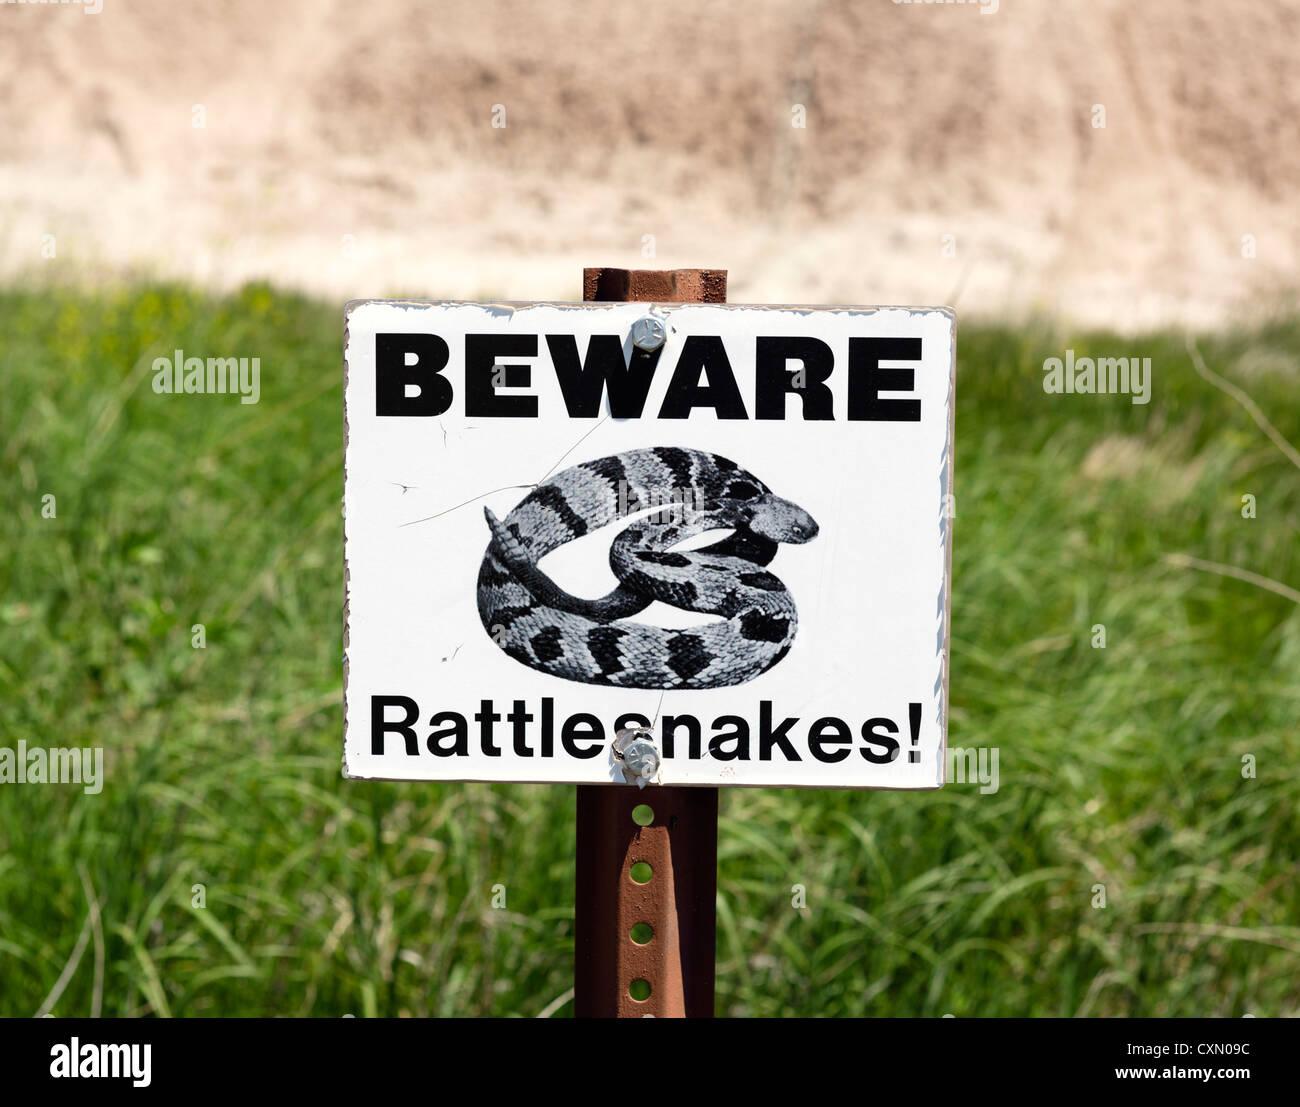 Beware of Rattlesnakes sign, Badlands National Park, South Dakota, USA Stock Photo